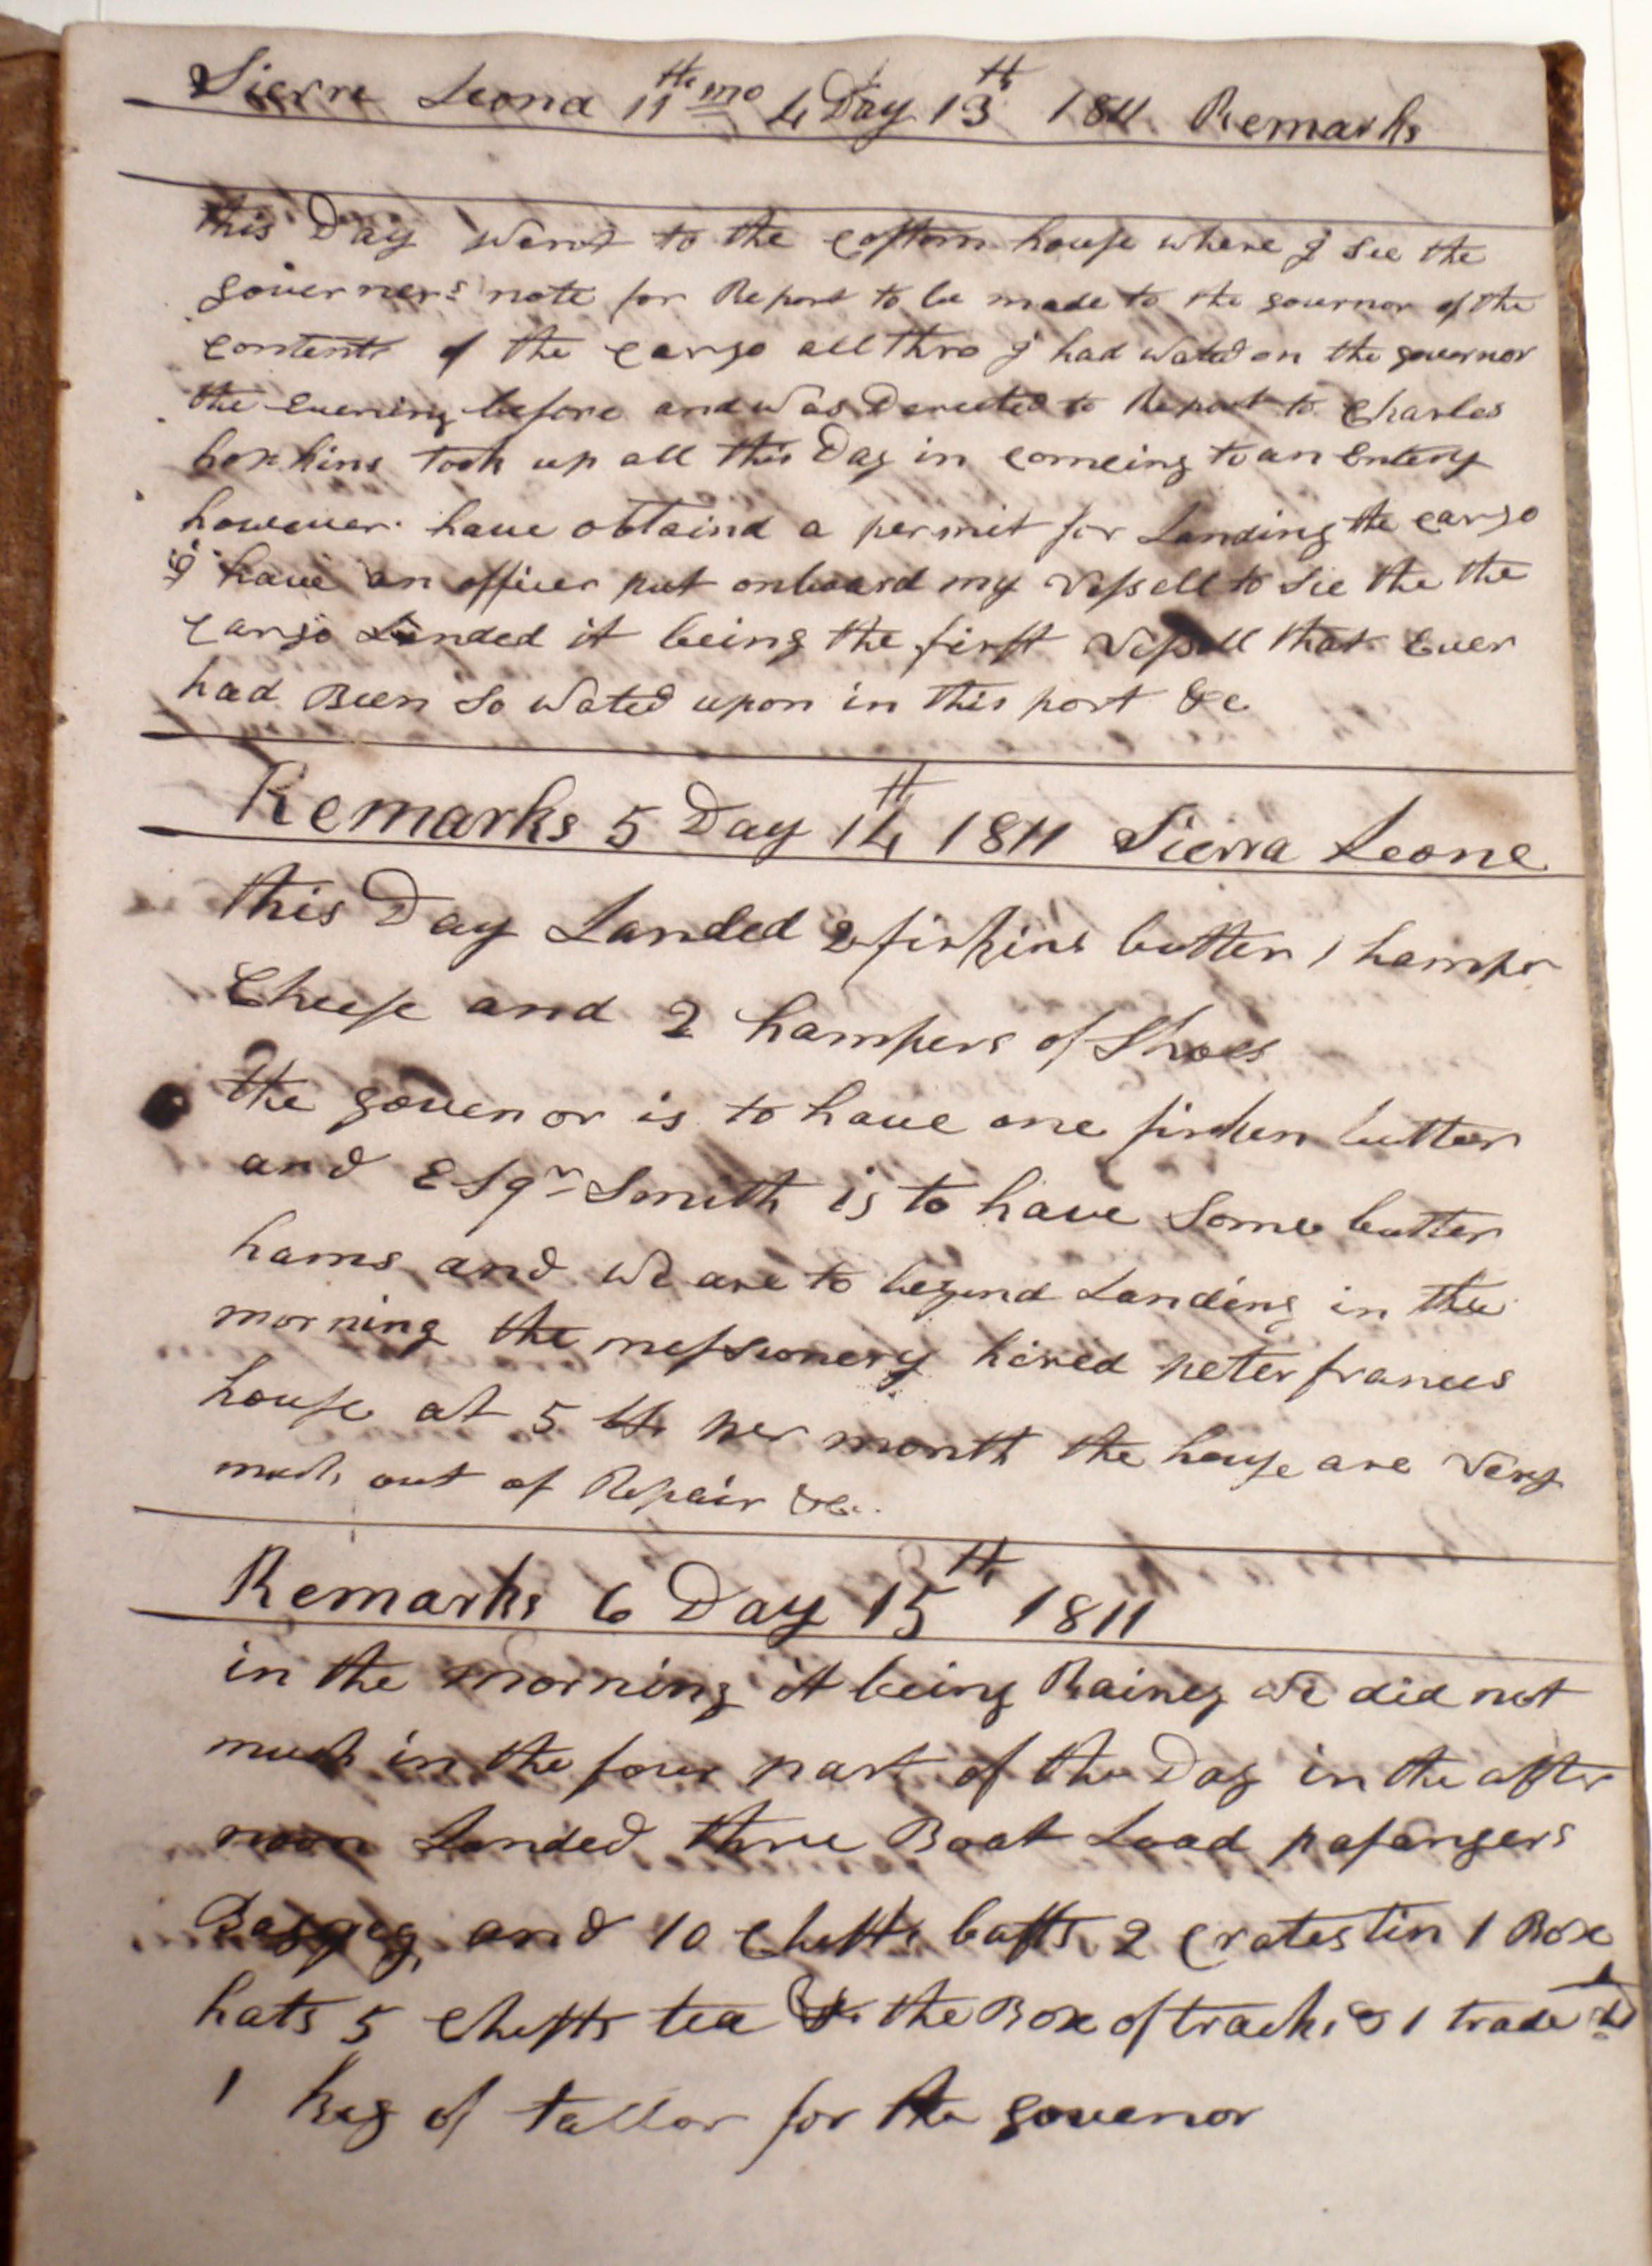 Traveller log book, 13-15 Nov 1811 (Cuffe Papers, NBFPL)